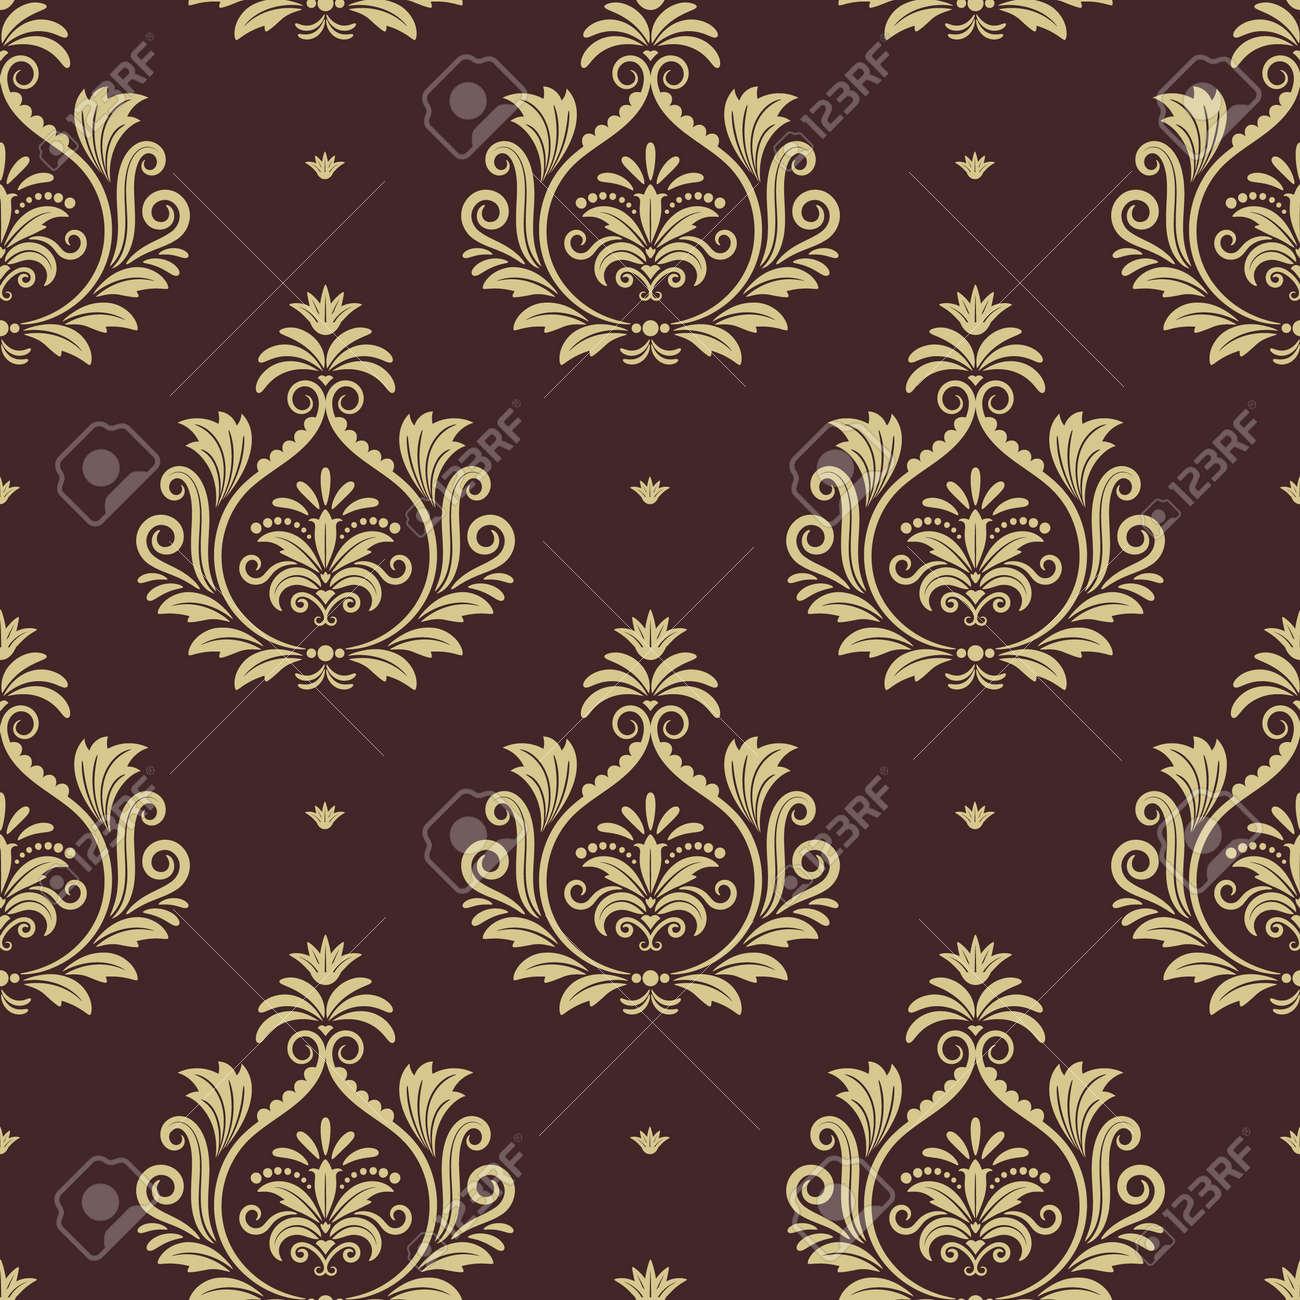 Royal seamless background. Wallpaper with floral element. Vector illustration design - 167043099